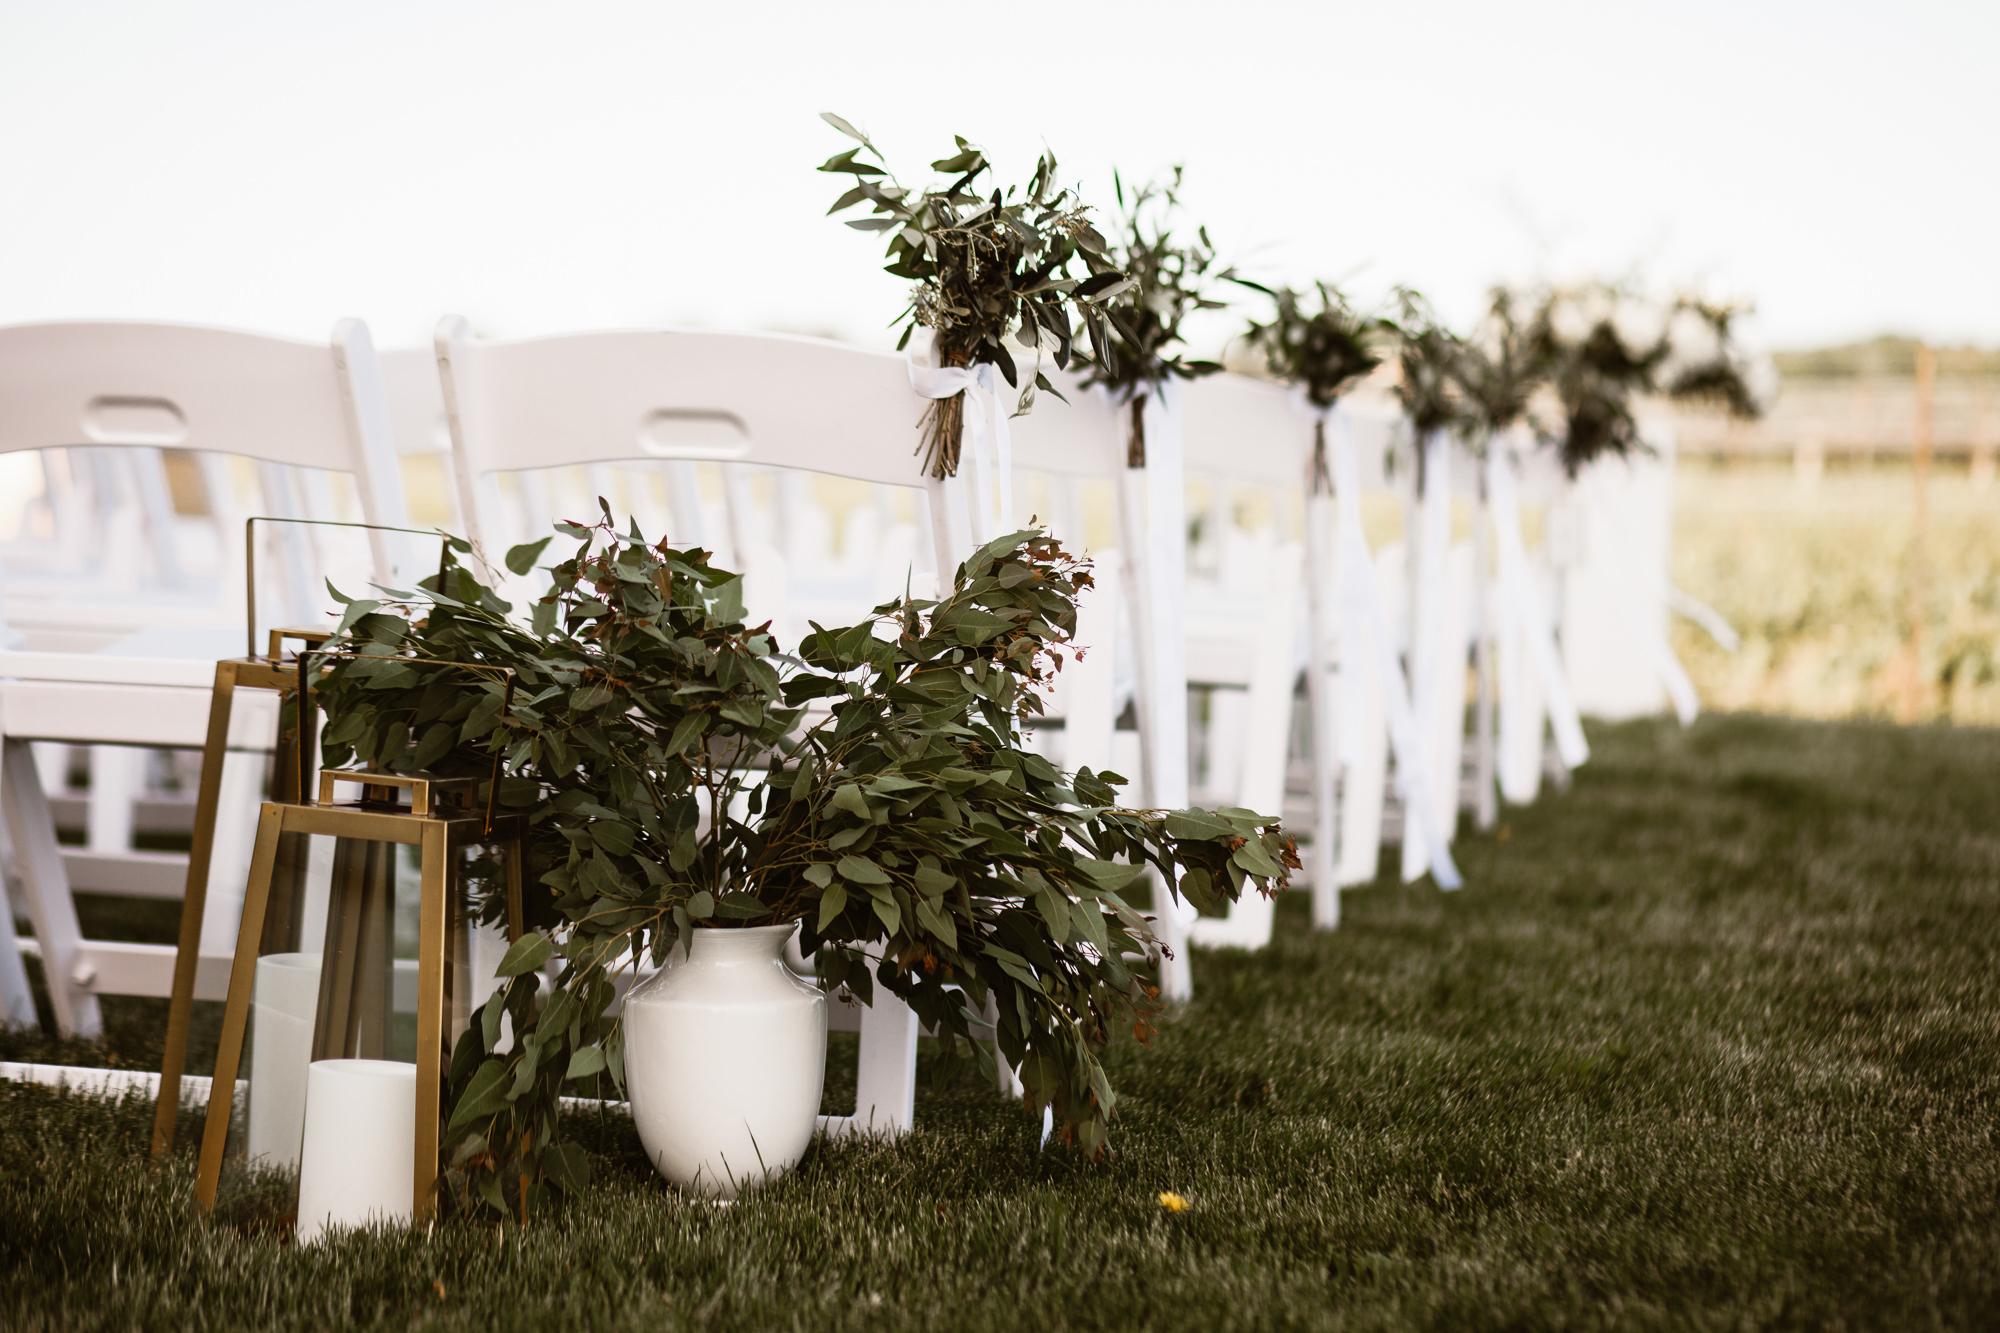 stratus-winery-wedding-vineyard-wedding-vineyard-bride-photo-by-reed-photography-036.jpg